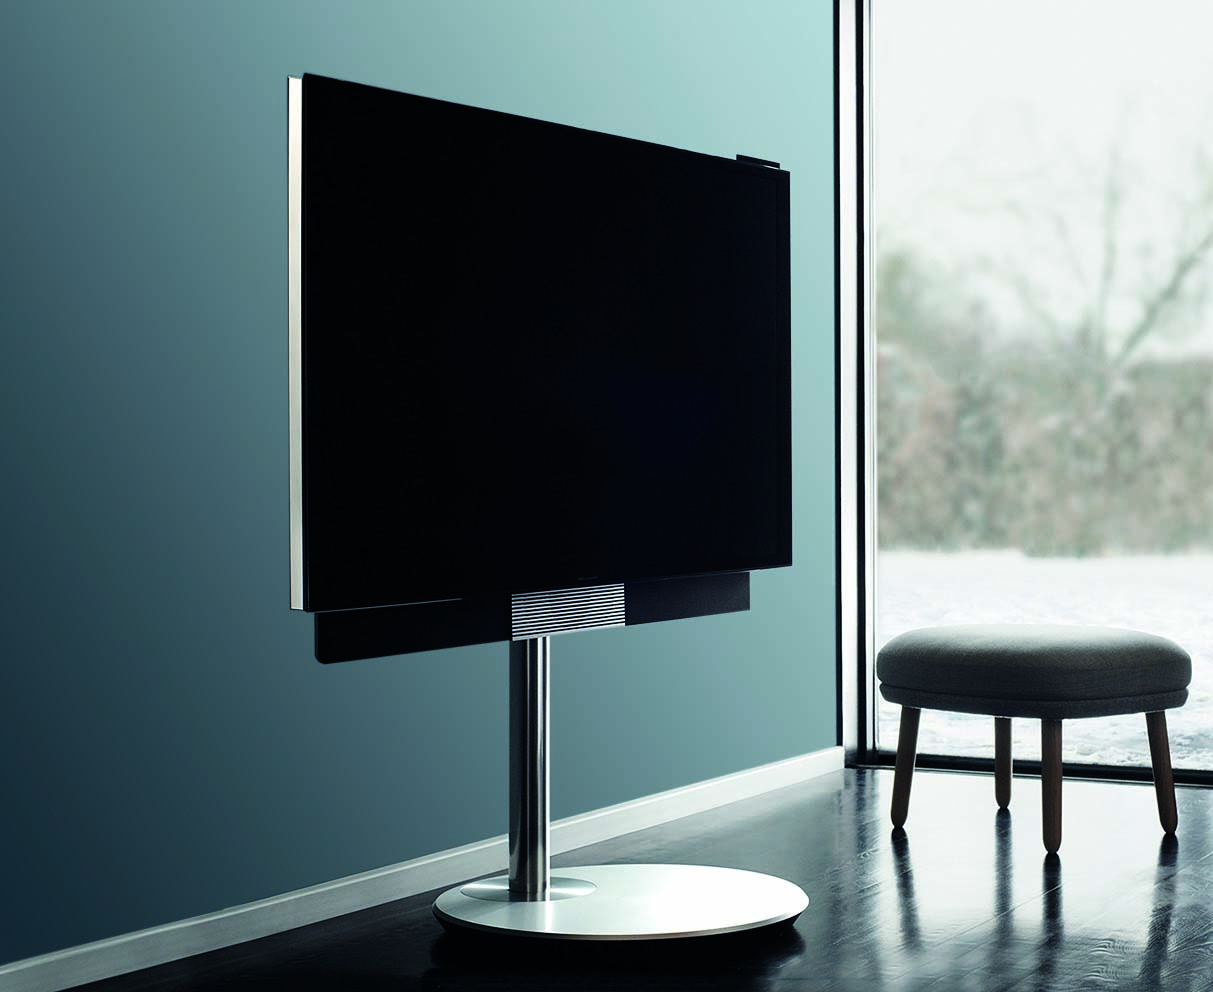 olufsen beovision 4 103 inch plasma television digital trends. Black Bedroom Furniture Sets. Home Design Ideas